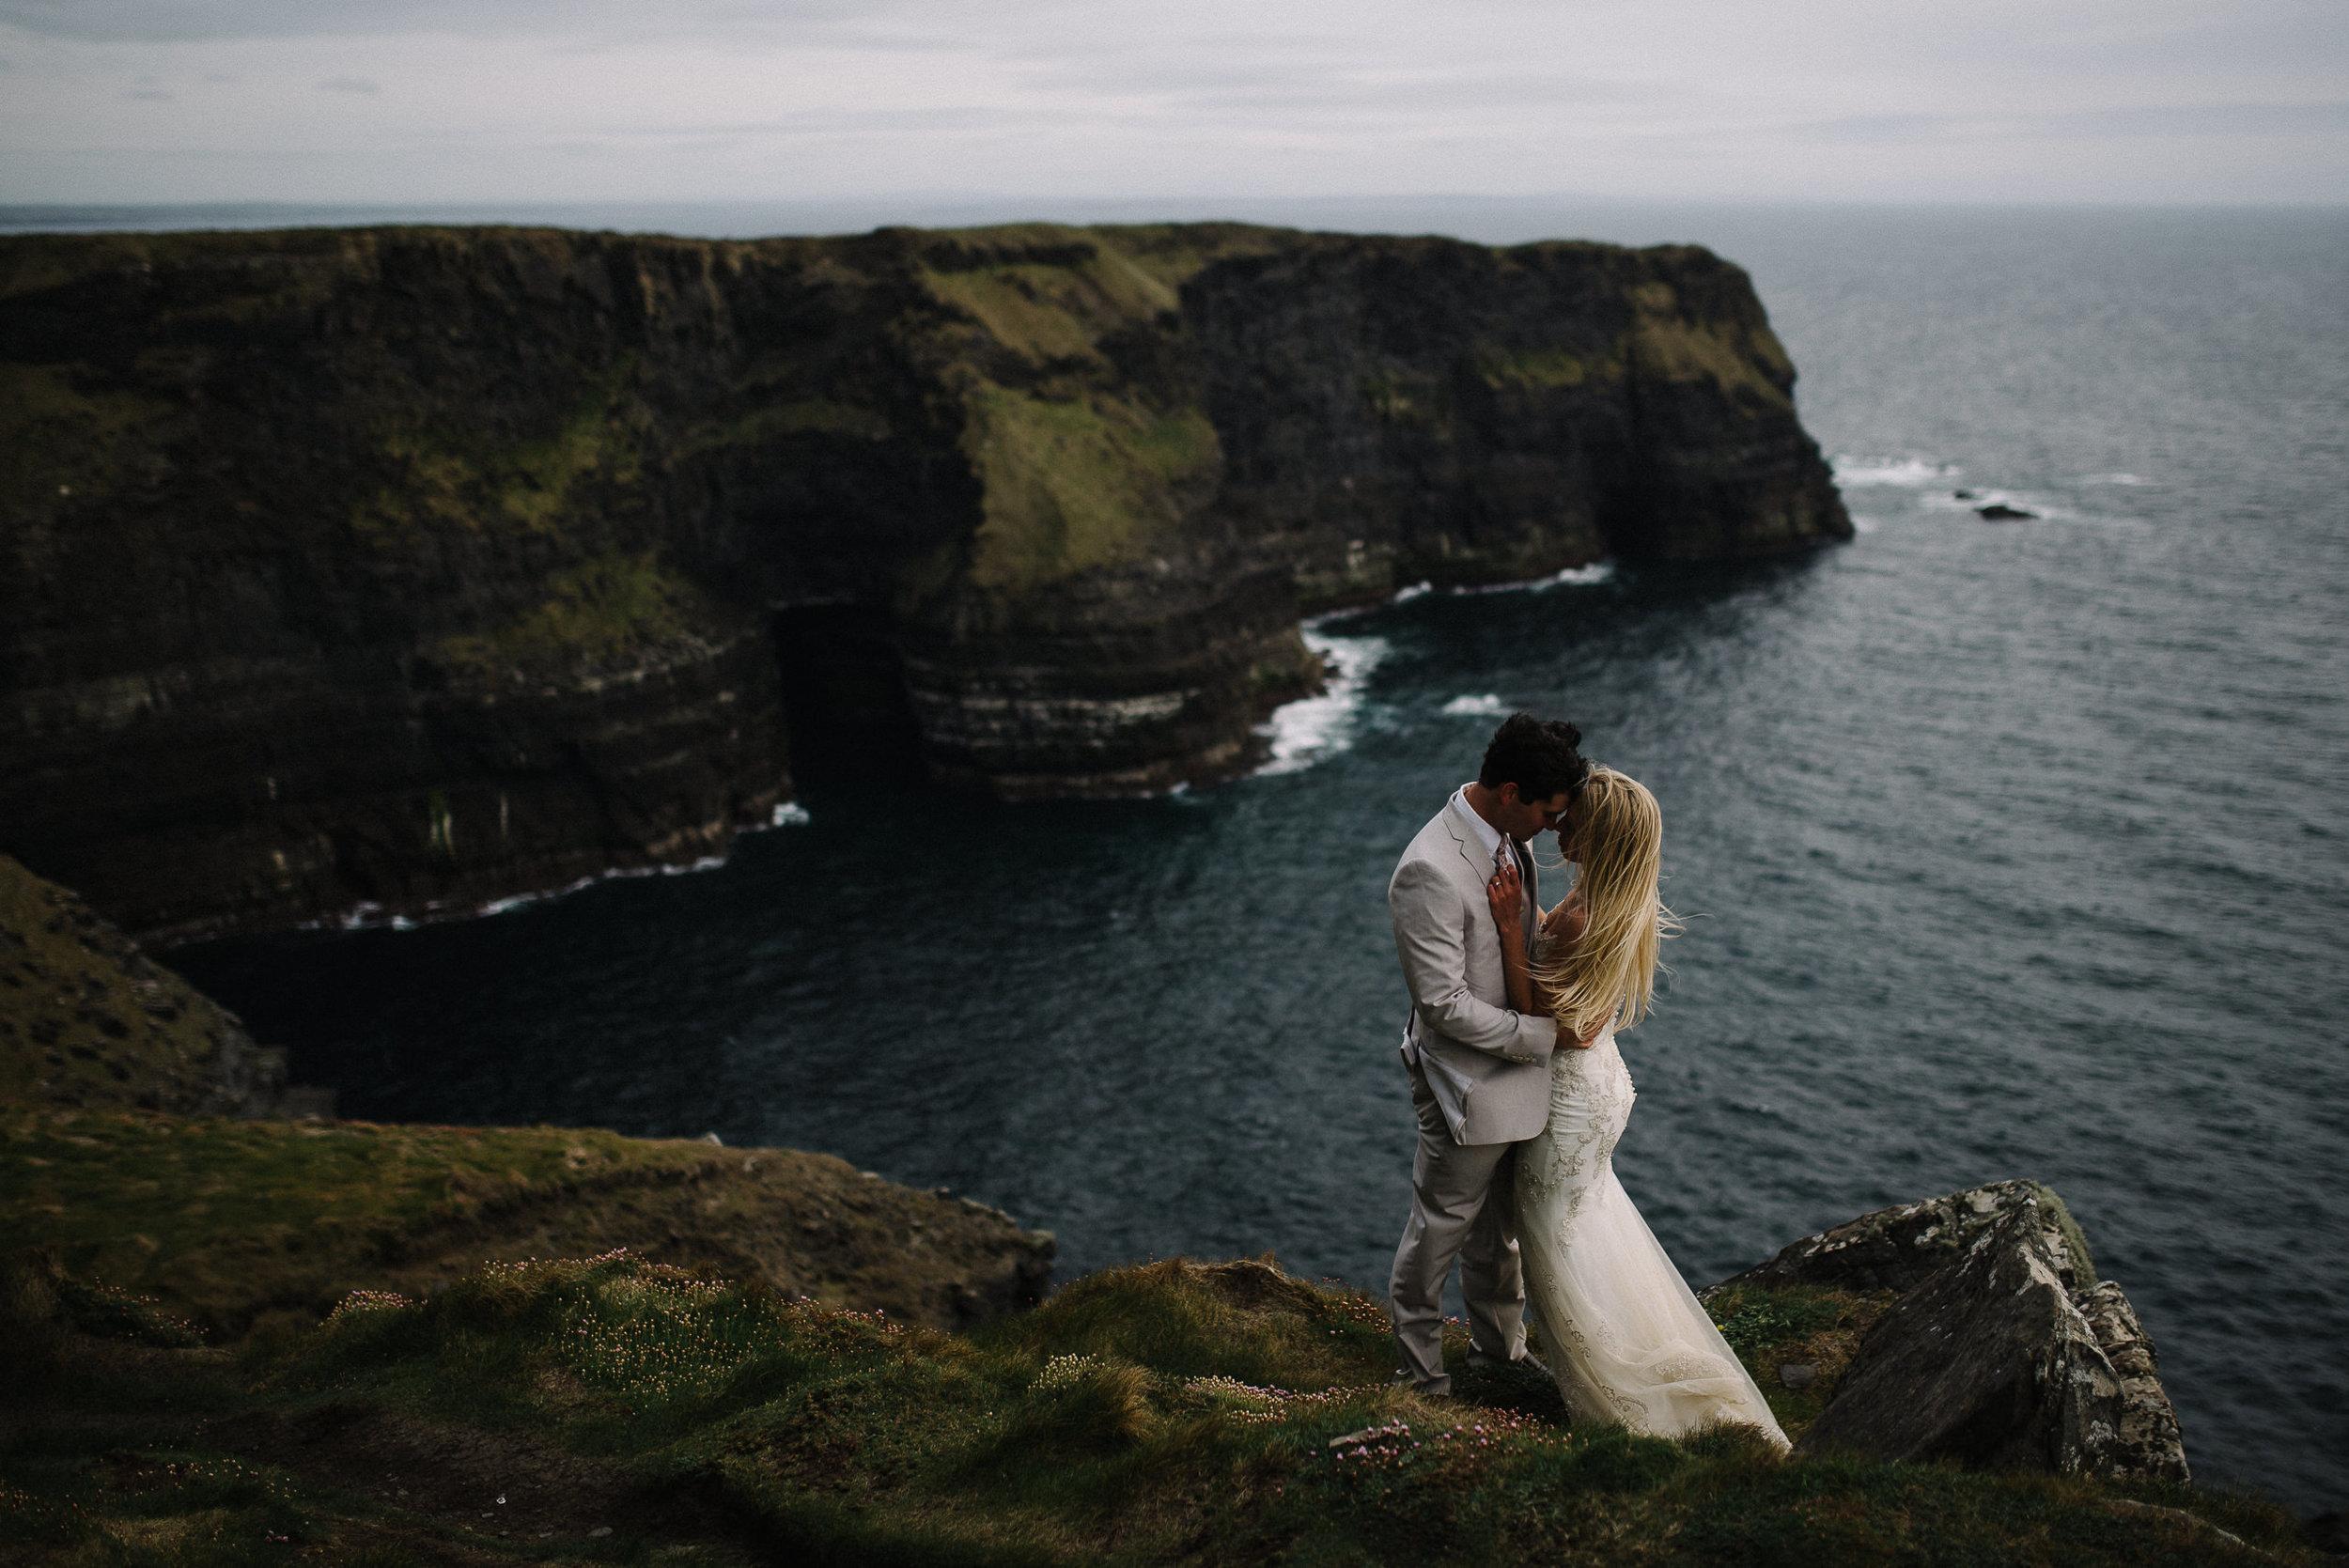 wedding-photography-workshop-epic-love-18.jpg